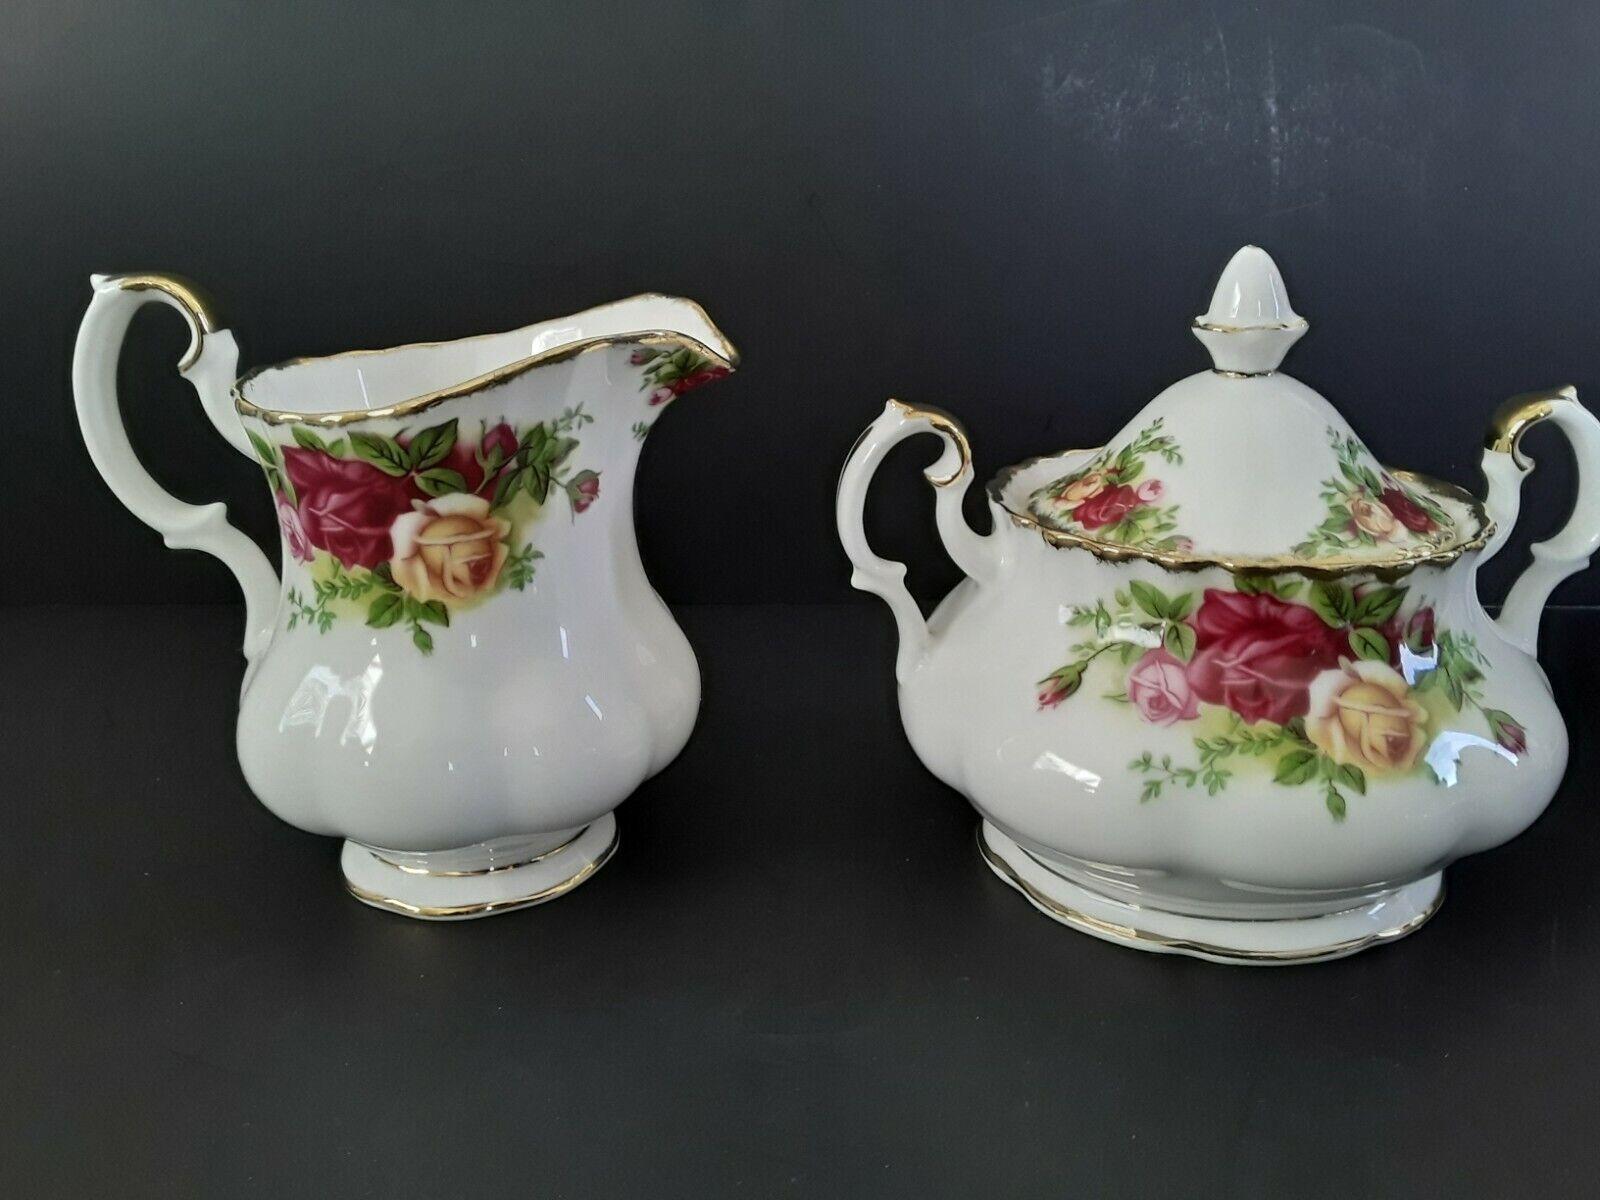 SALE Royal Albert Old Country Roses Bunny Rabbit Sugar and Creamer